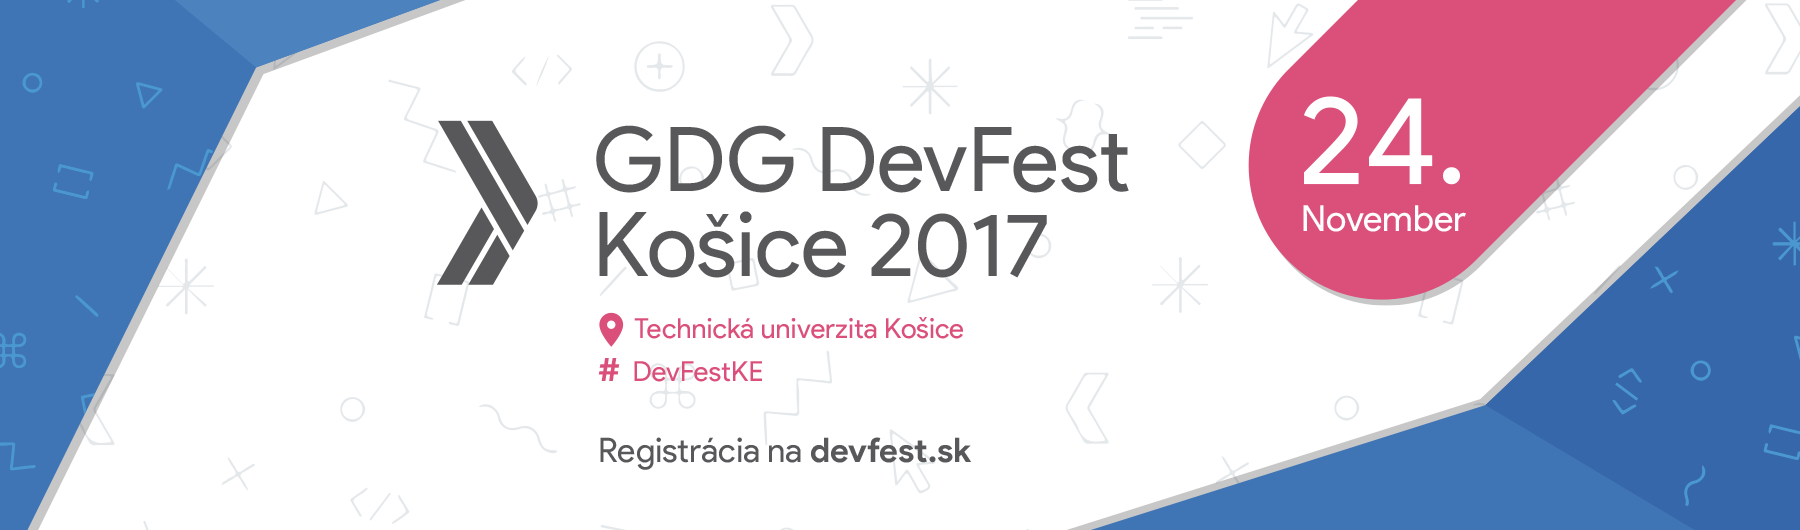 GDG DevFest Košice 2017